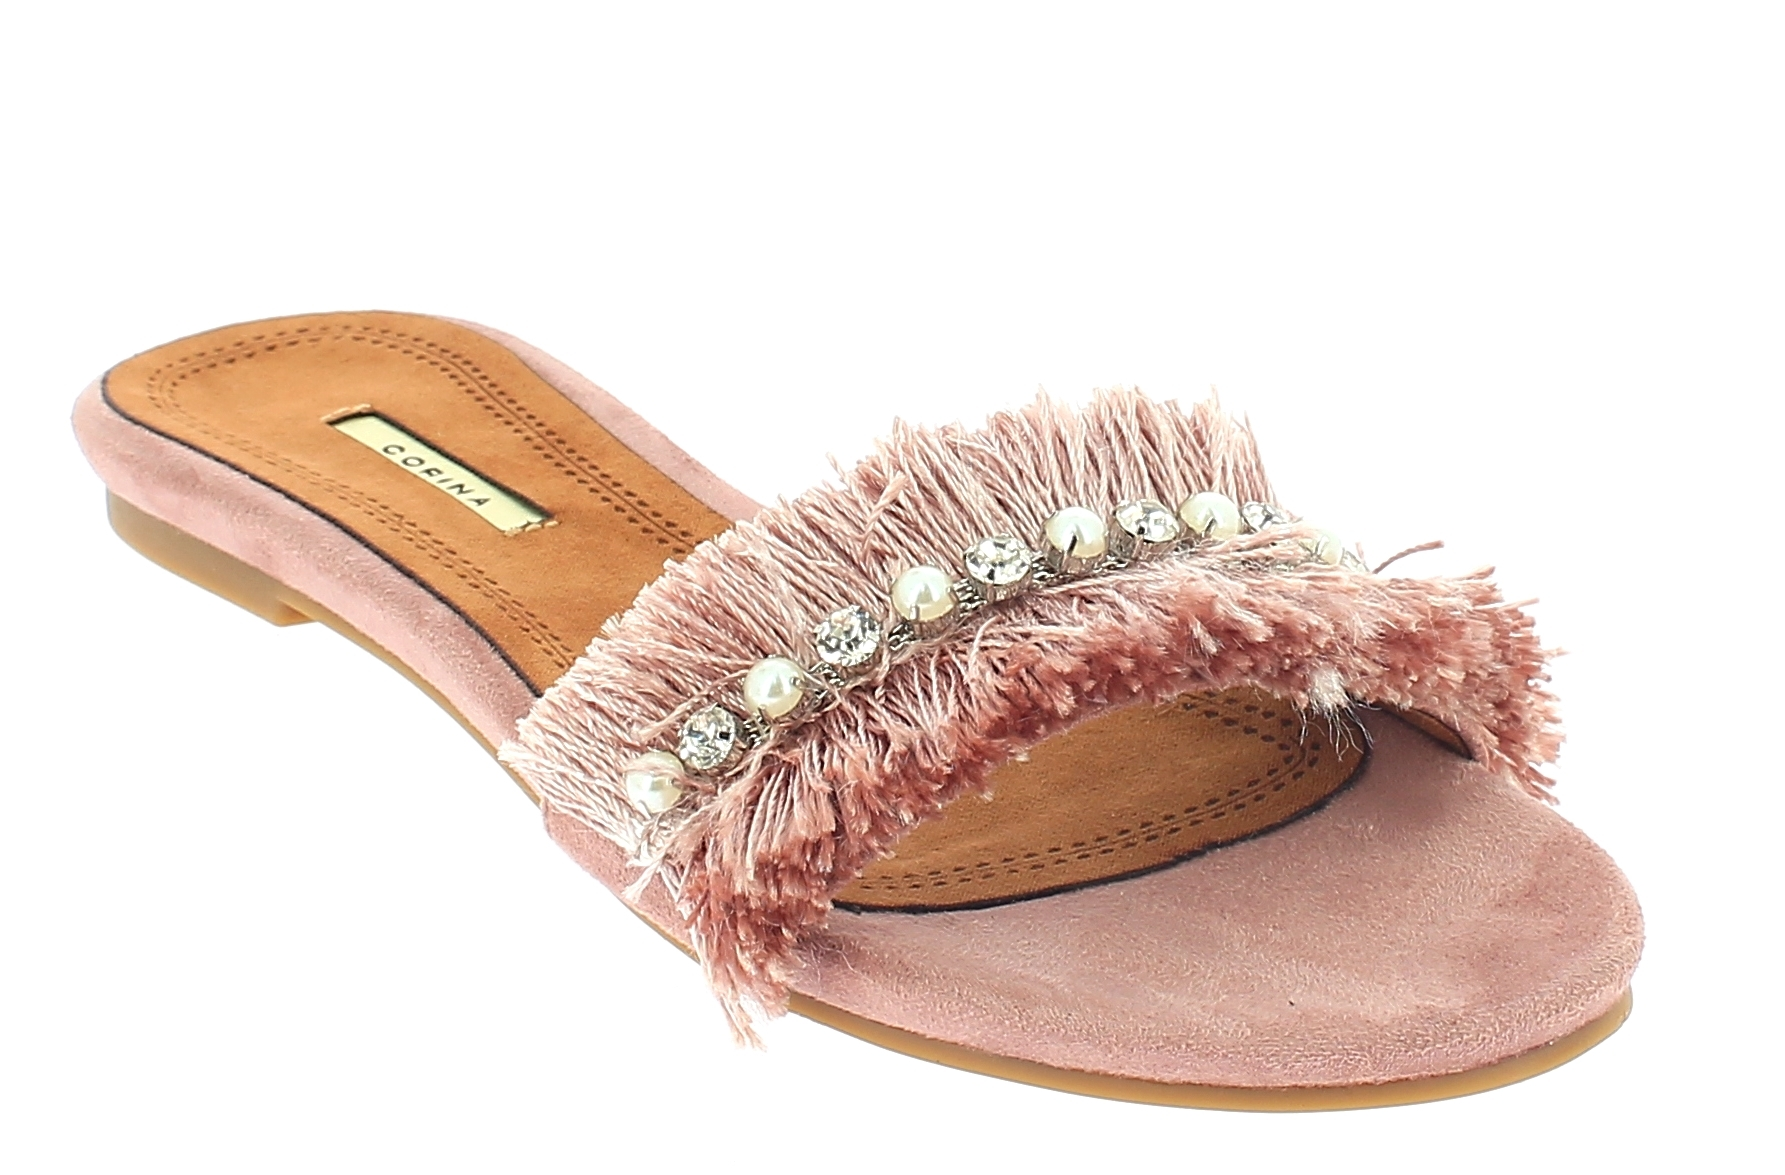 CORINA Γυναικεία Σανδάλια C8459 Ροζ - IqShoes - C8459 ROSA-CORINA-pink-37/1/11/2 παπούτσια  new in